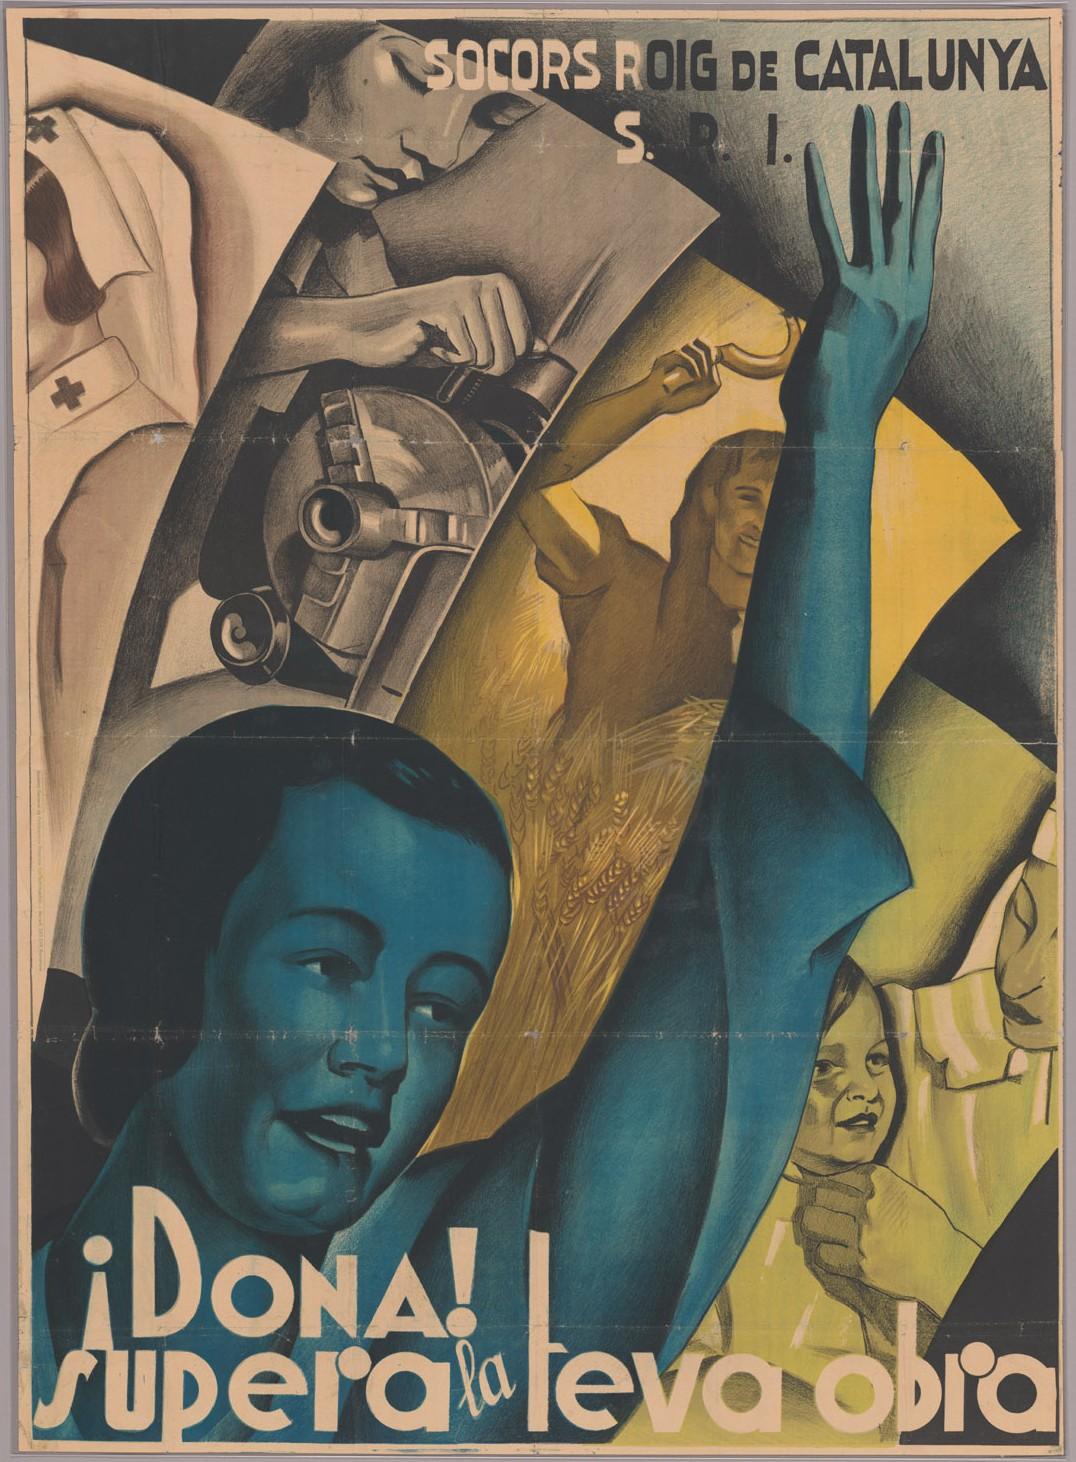 """¡Dona! supera la teva obra"" poster with Harry C. Shepard Jr. letter on verso , Veterans of the Abraham Lincoln Brigade, Bay Area Post records, 1928-1995,BANC MSS 71/105 z. Courtesy of The Bancroft Library, University of California, Berkeley."